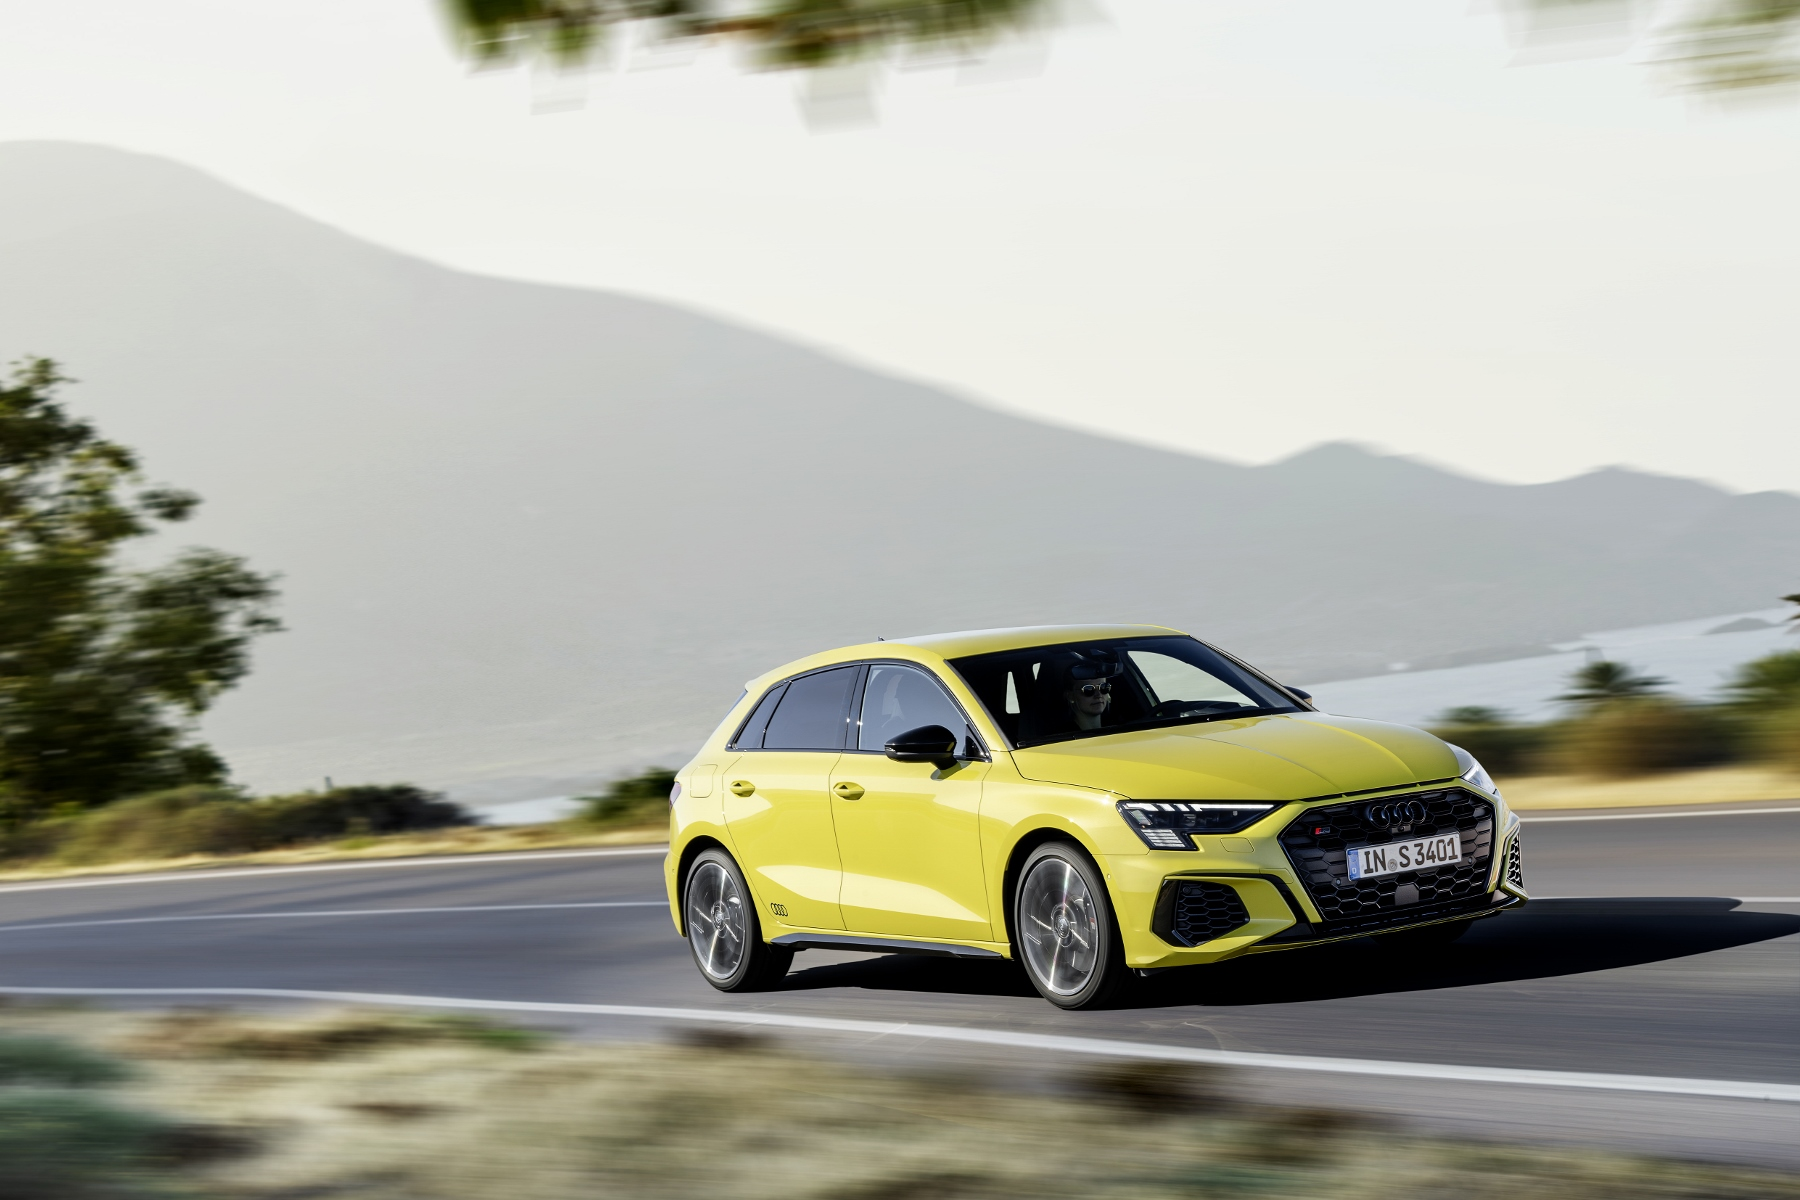 Audi ukázalo modely S3 Sedan a Sportback. Prezradilo aj nemeckú cenu pKdbuOiQuk a204408large-1800x12